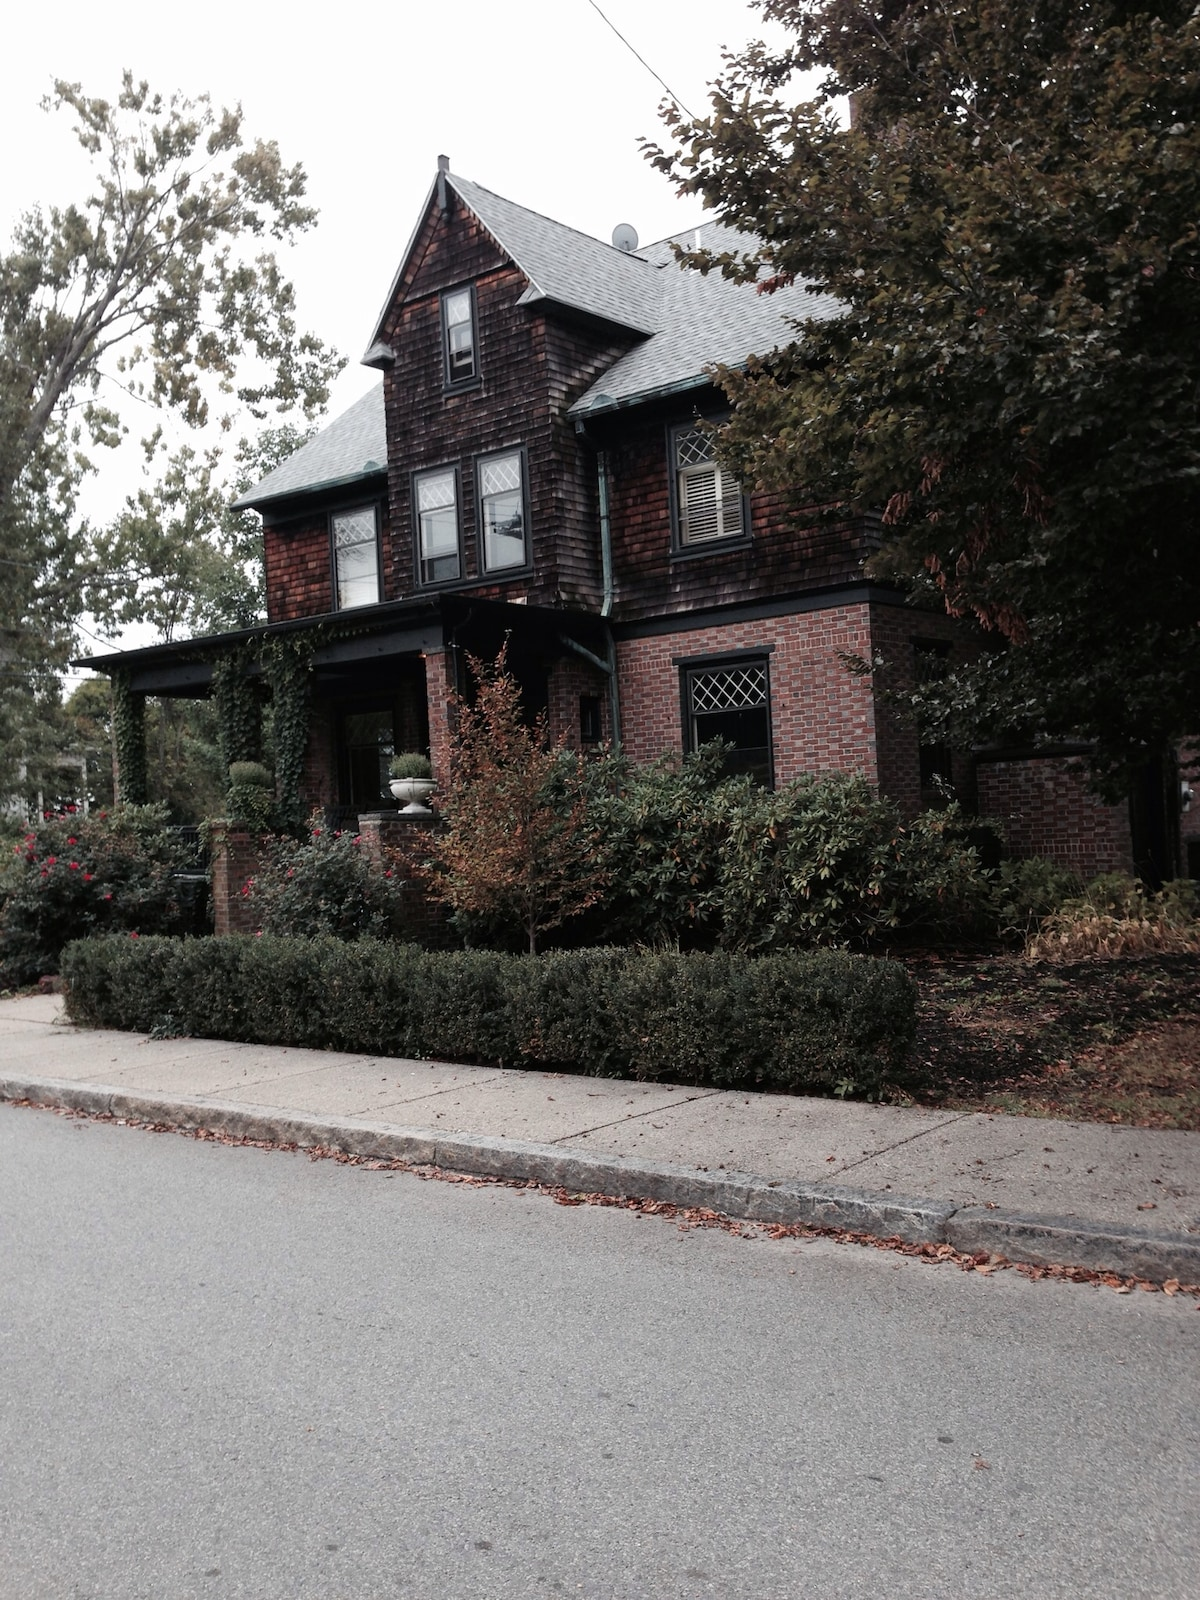 Historic Home in Warren, RI.